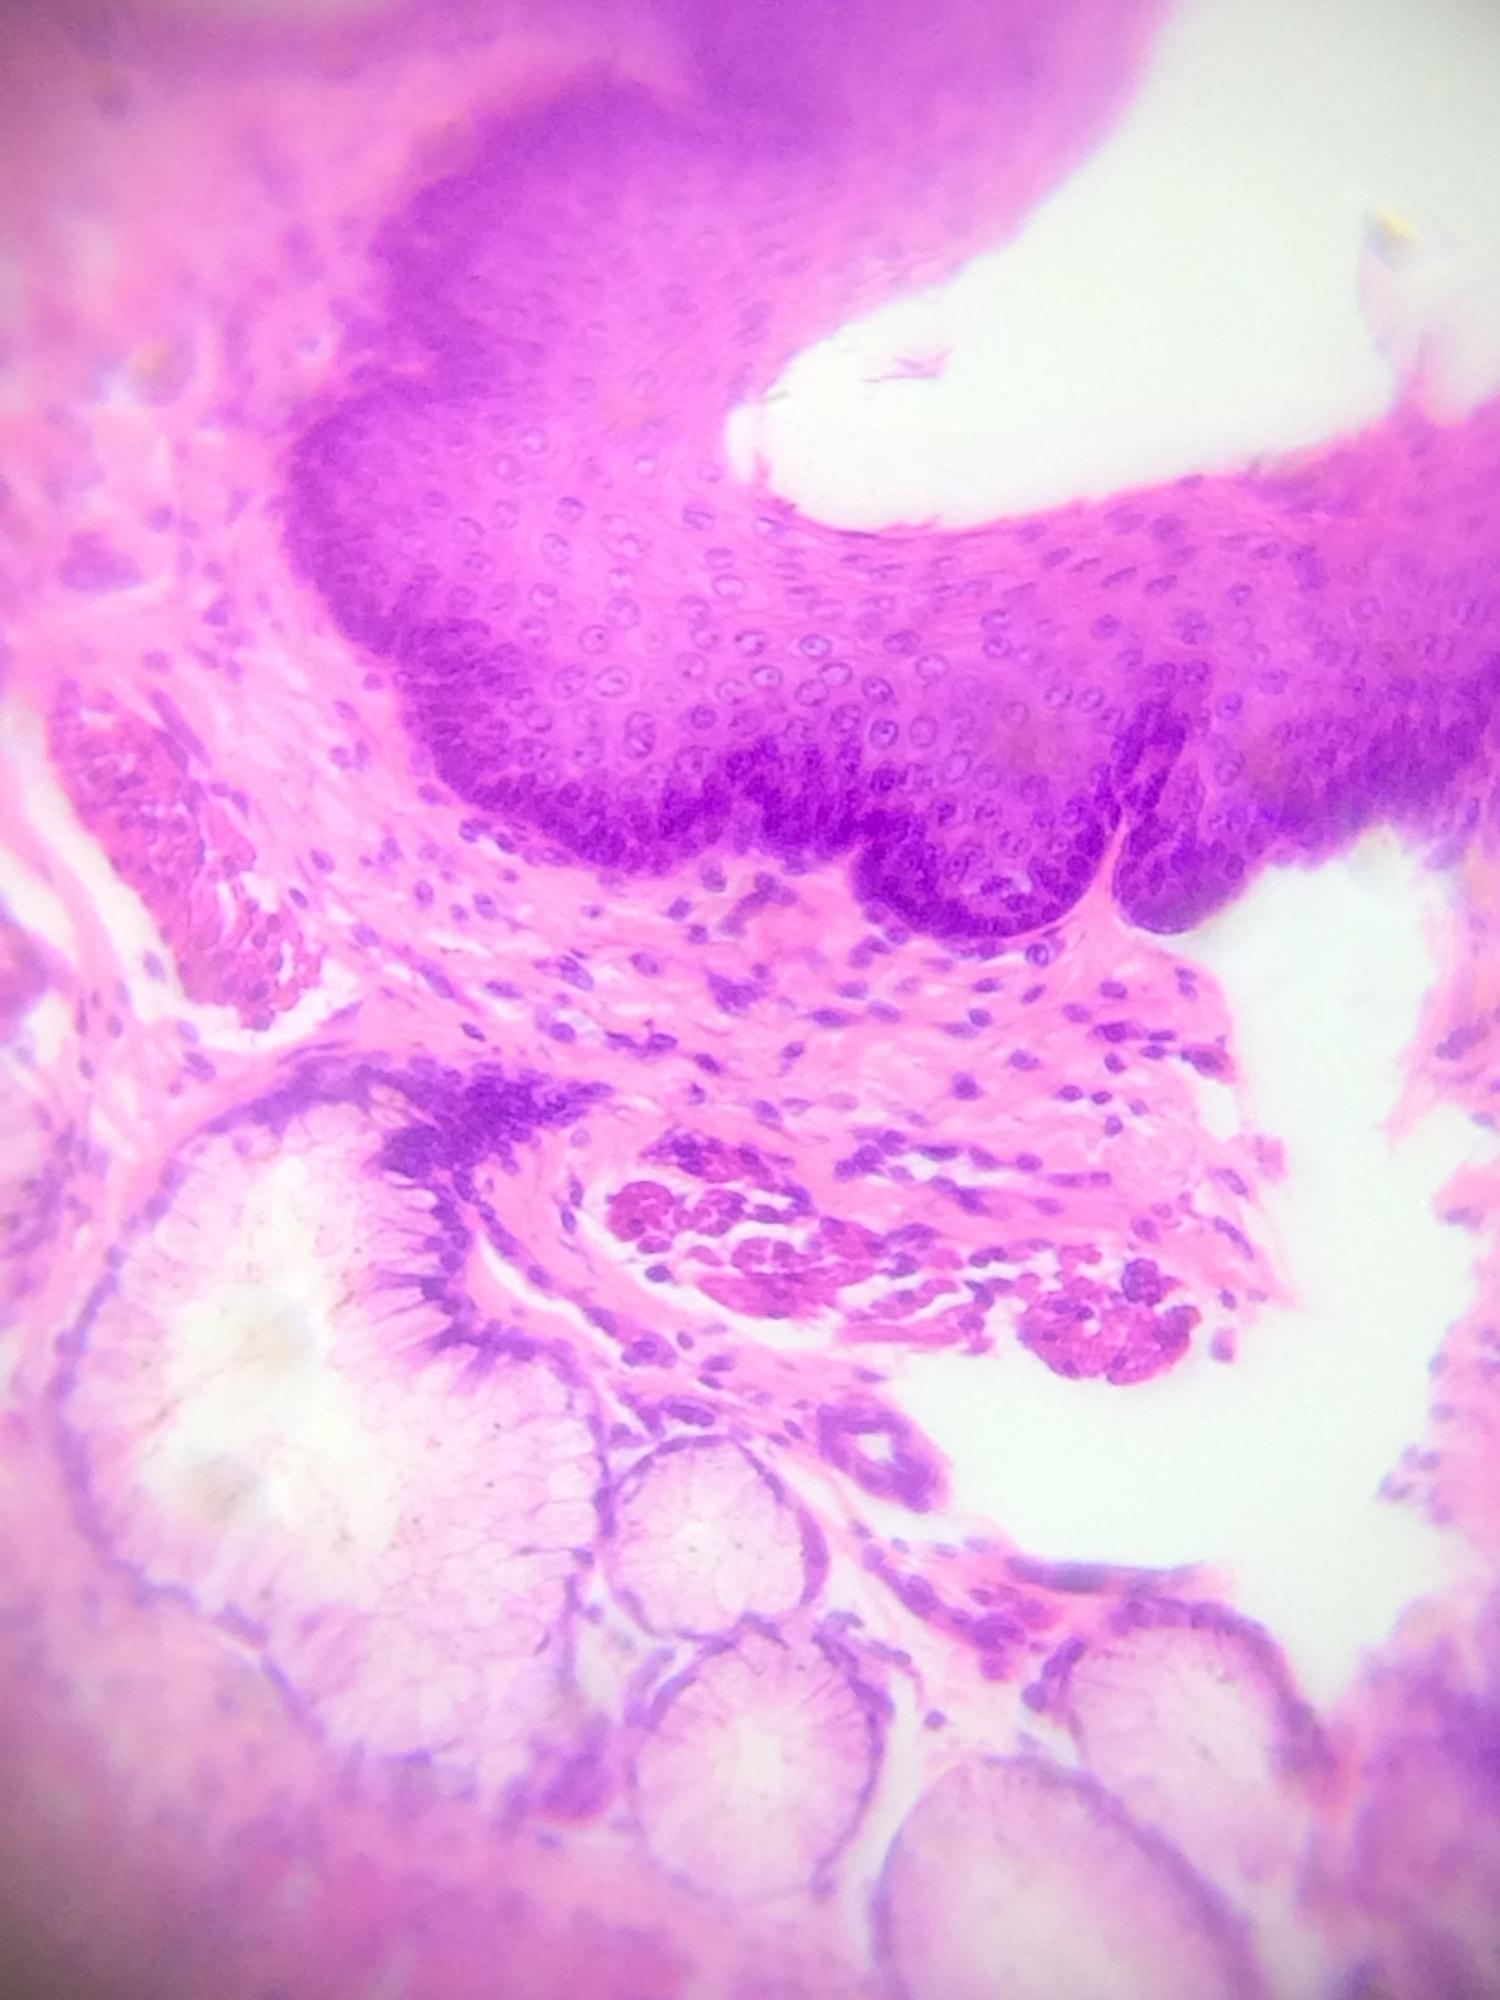 Esophagus tissue at ~377x (170x optical with 2.22x digital)